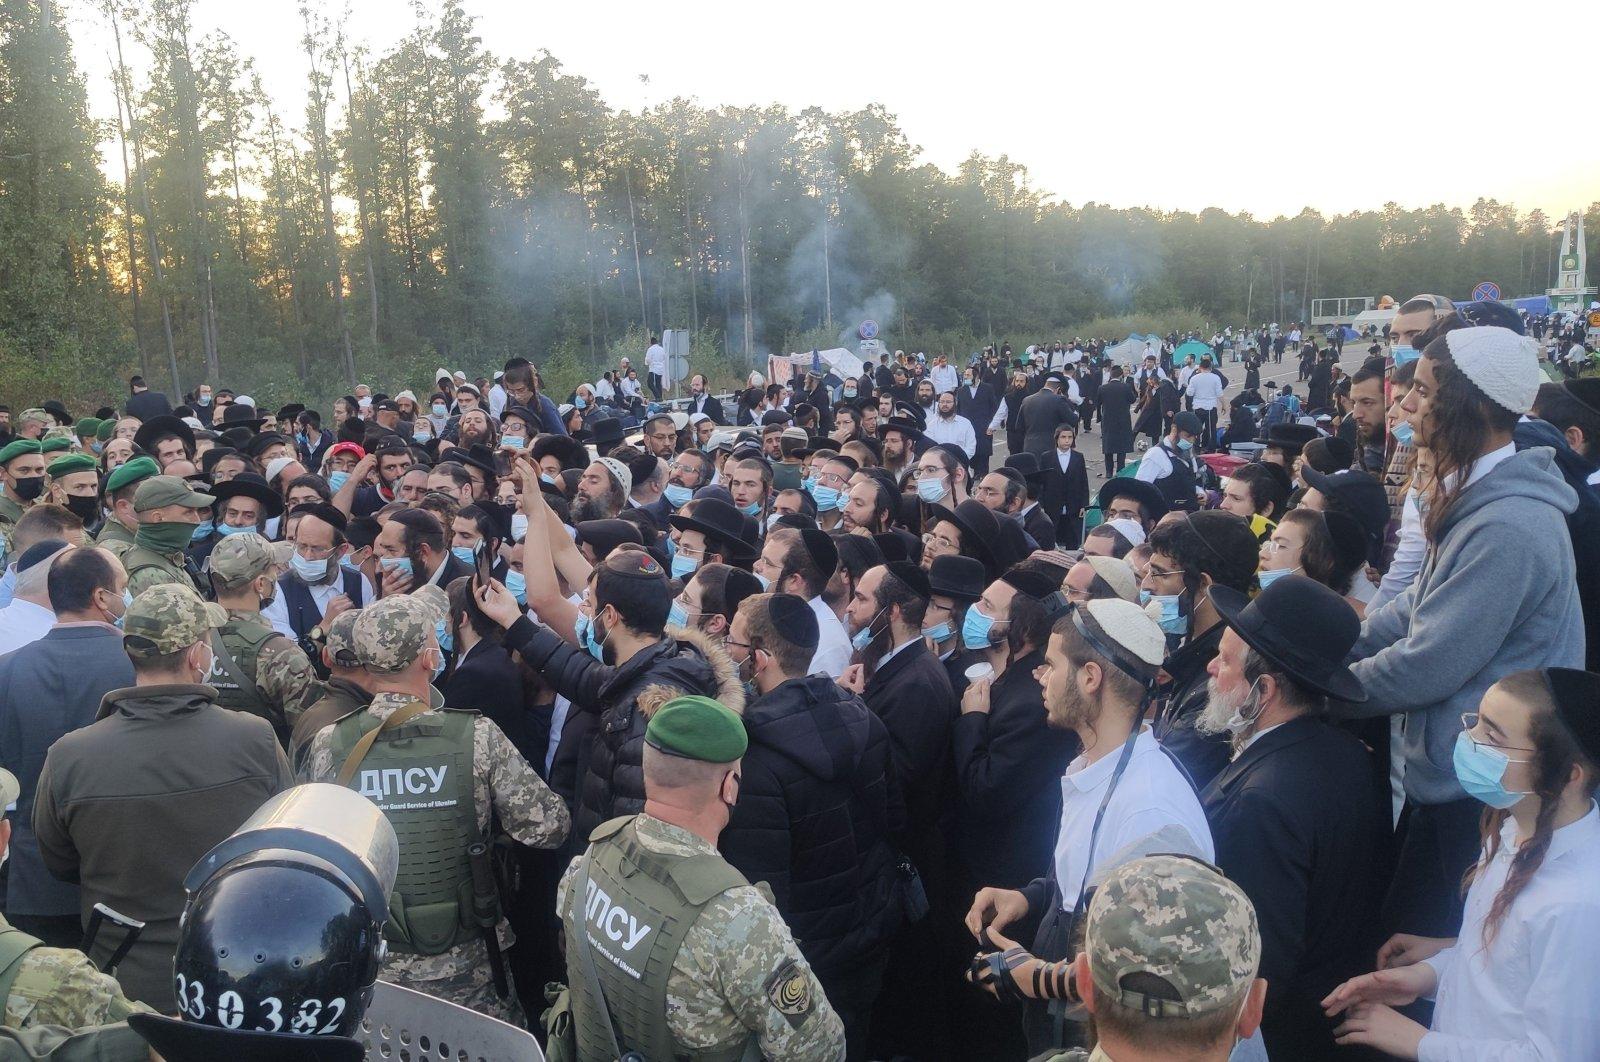 Jewish pilgrims are stuck between Ukrainian and Belarusian border crossings, Sept. 16, 2020. (Ukraine border guard service Photo via AFP)